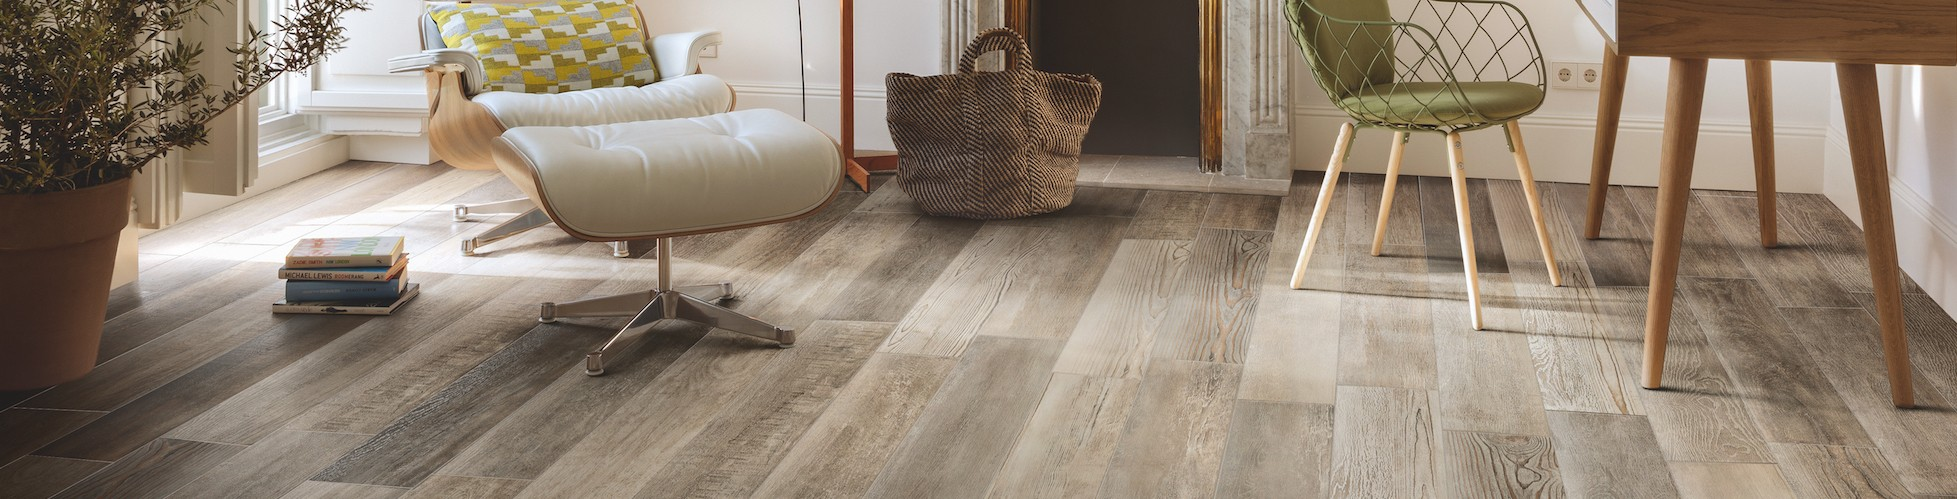 Elegant Flooring Ltd.  LinkedIn